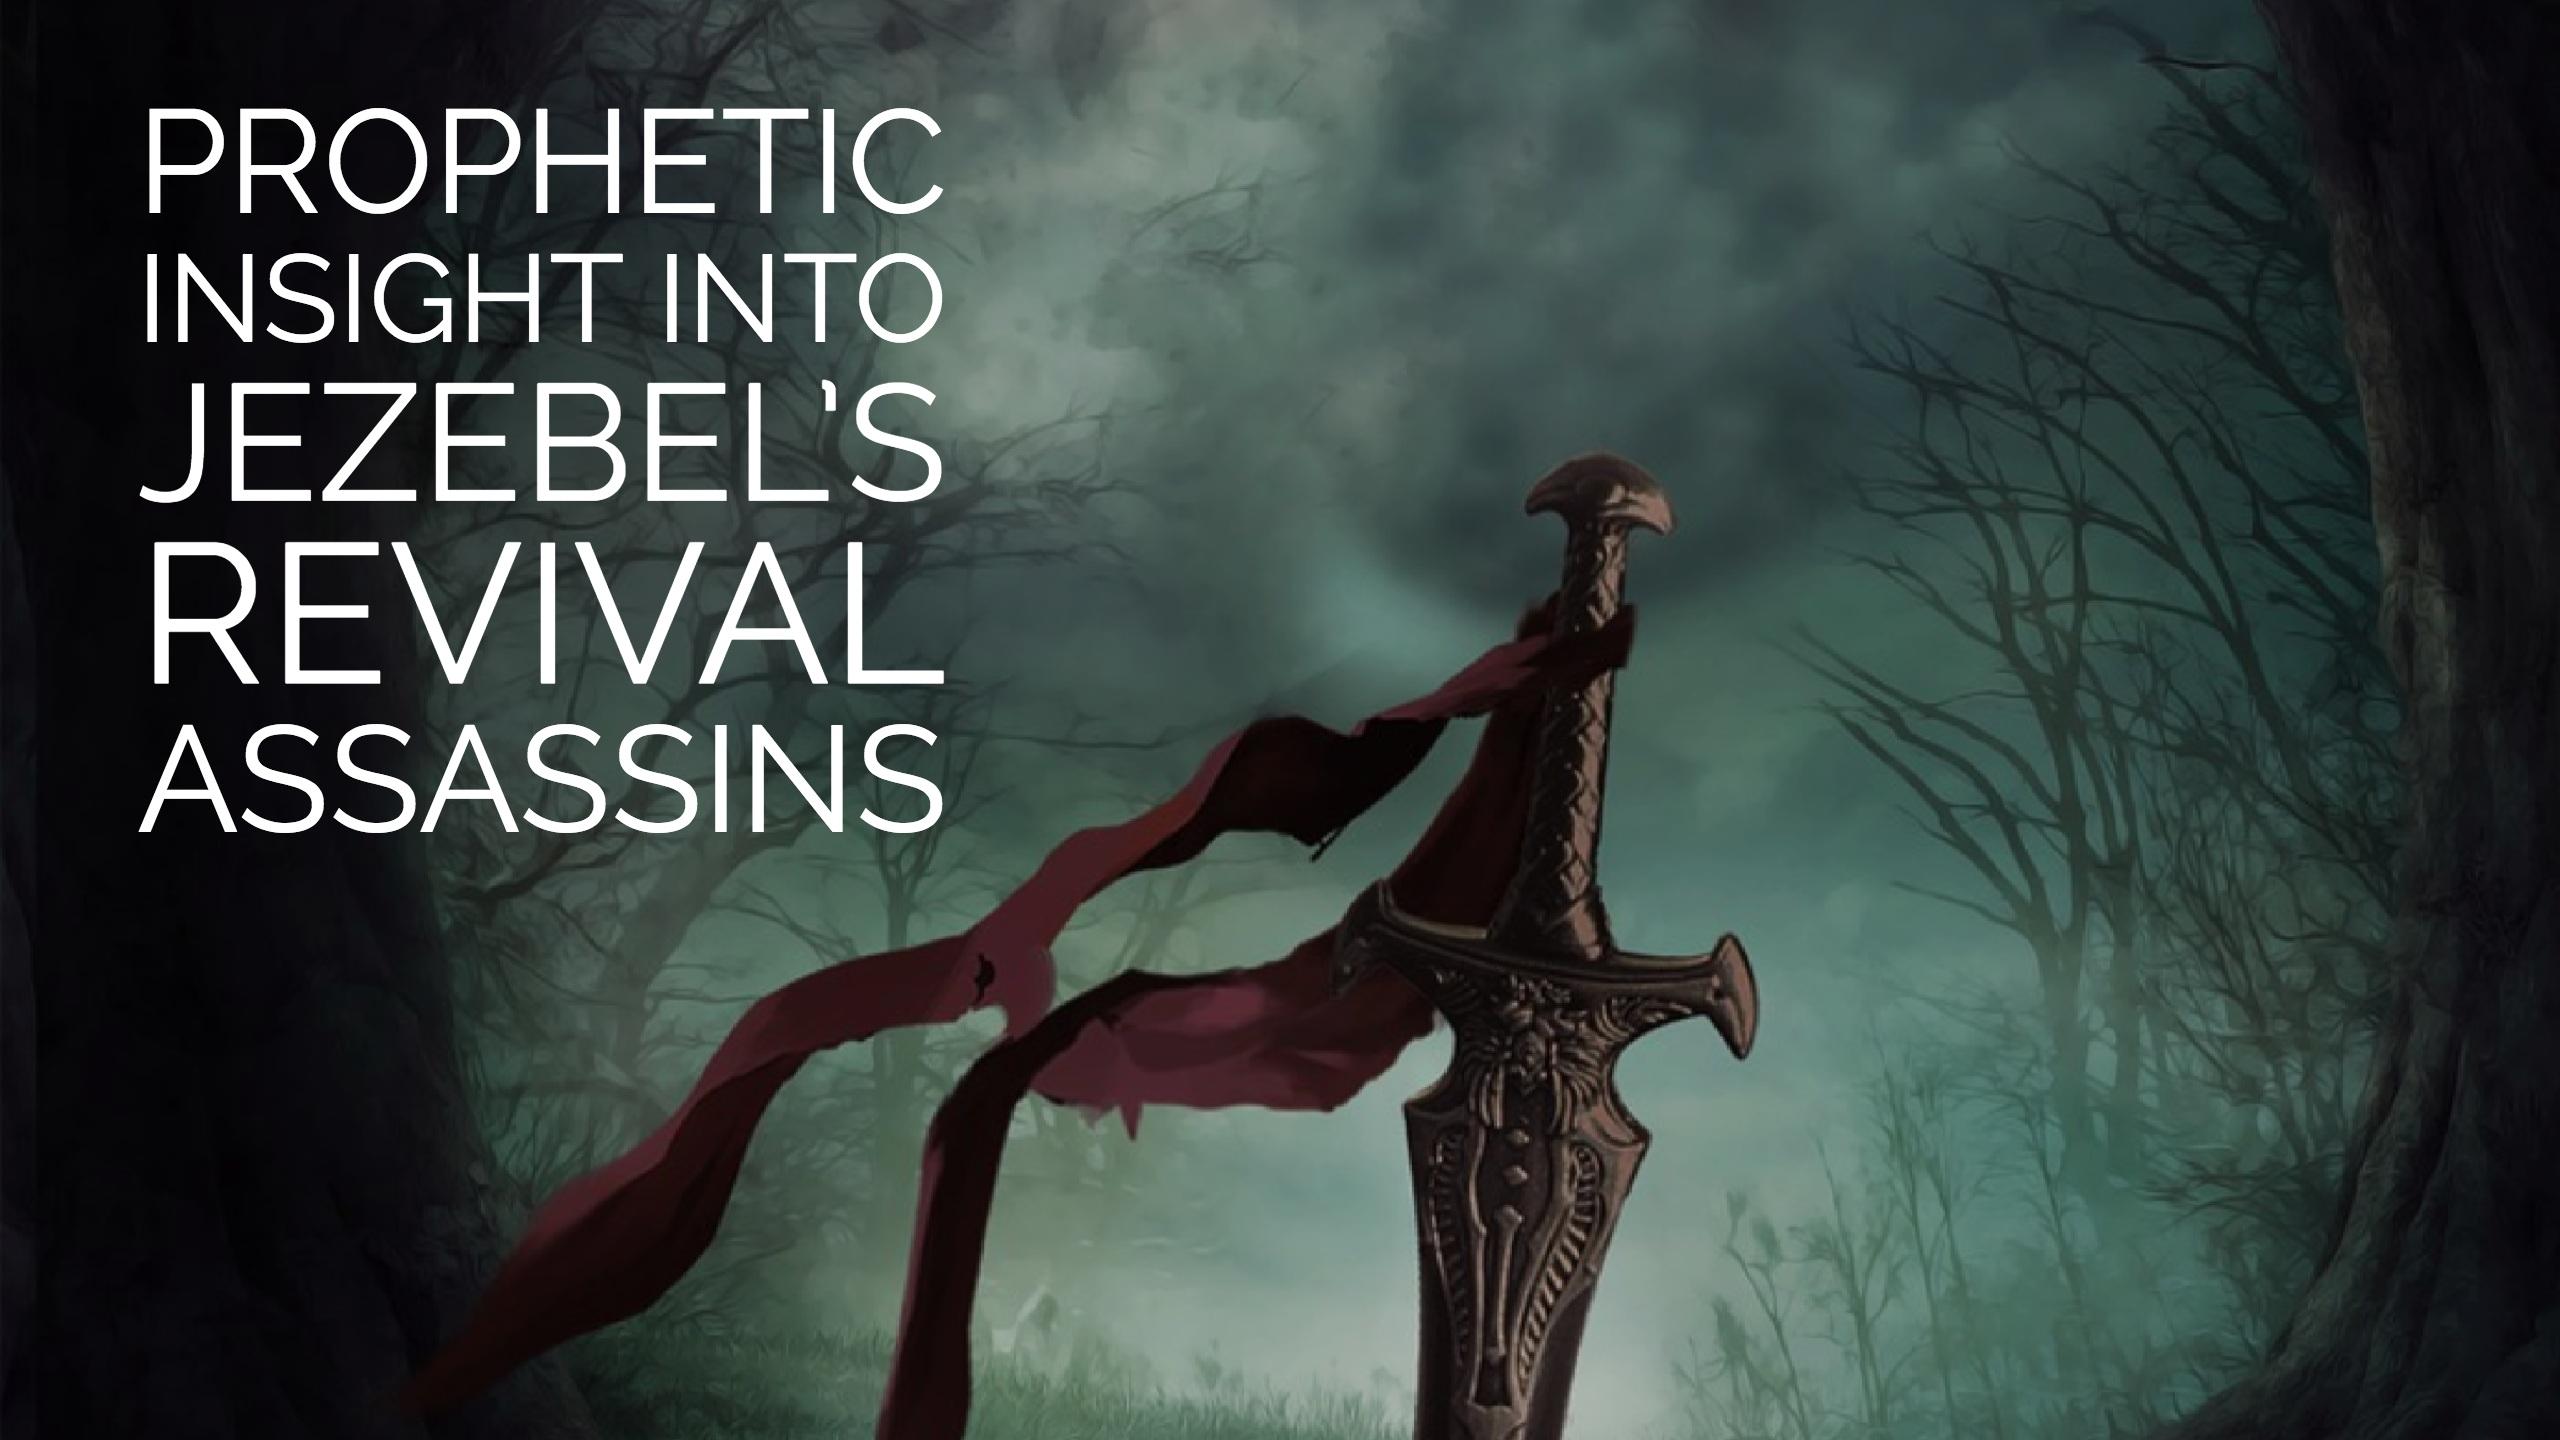 Prophetic Insight Into Jezebels Revival Assassins